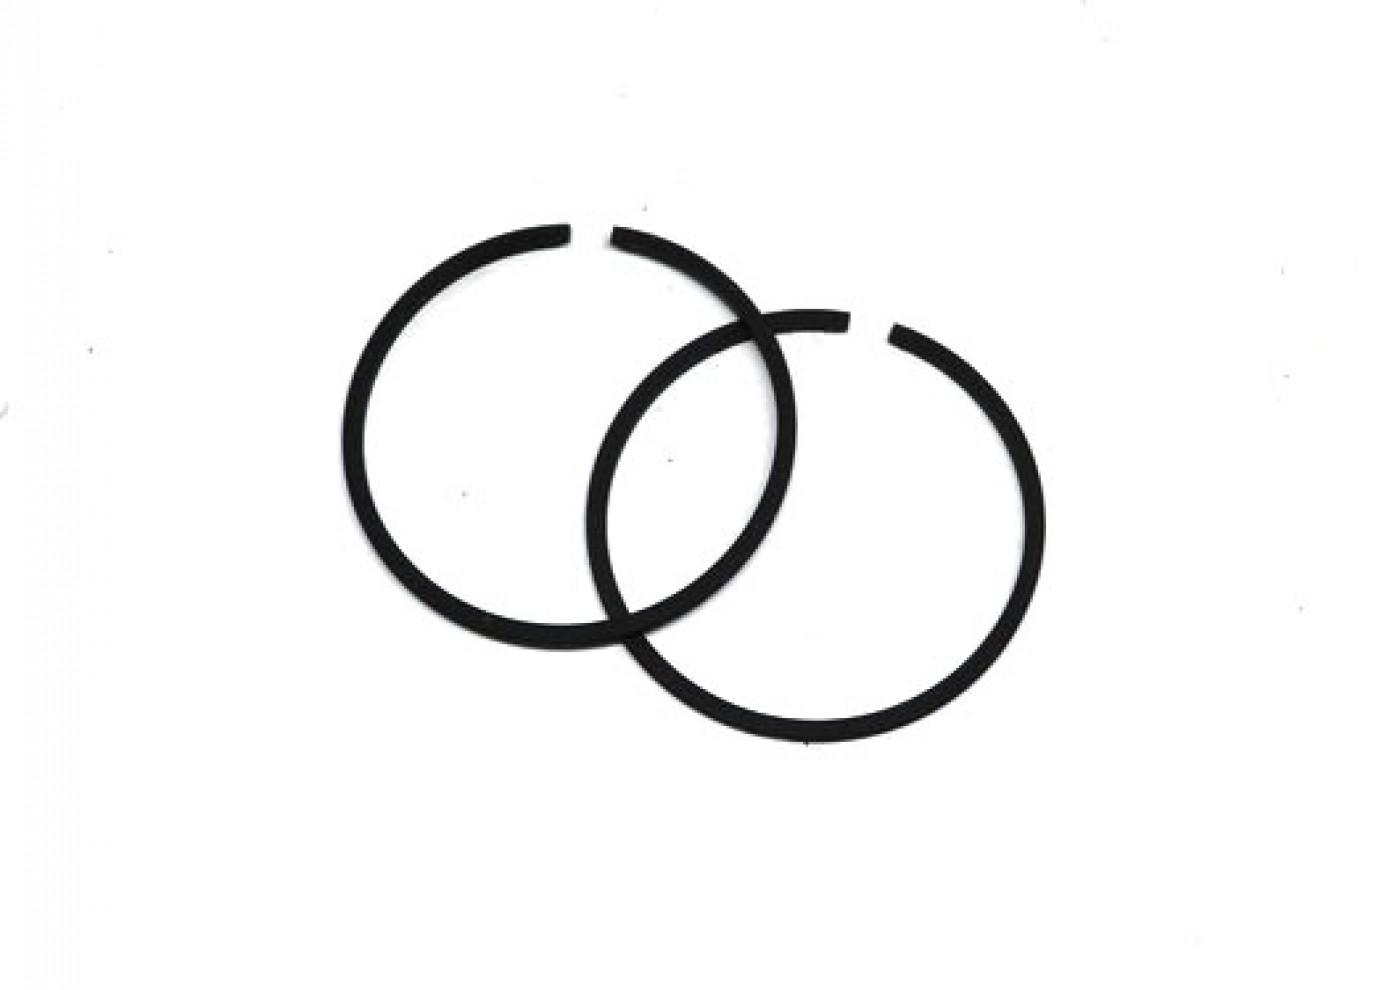 Sada kroužků 44,7 mm x 1,2 mm